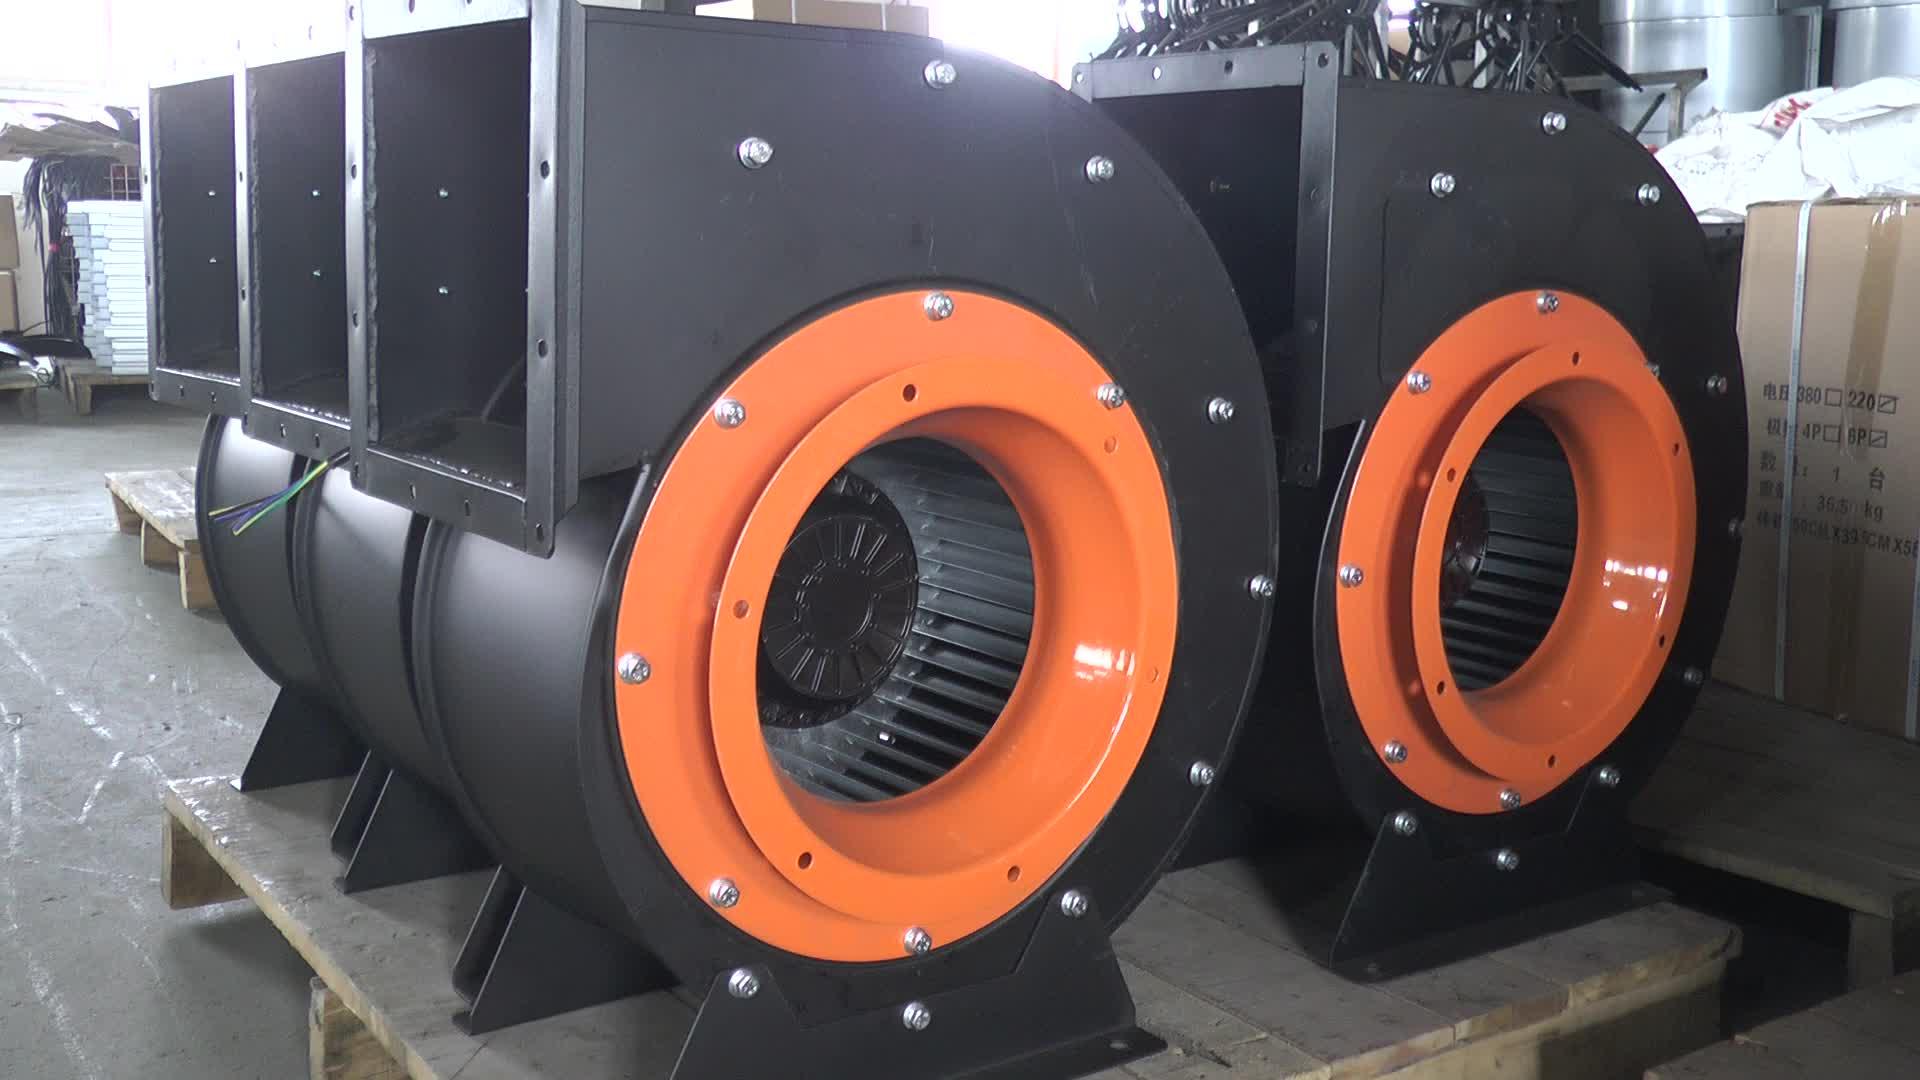 Metalen kleine industriële ac blower rustige centrifugaal ventilator